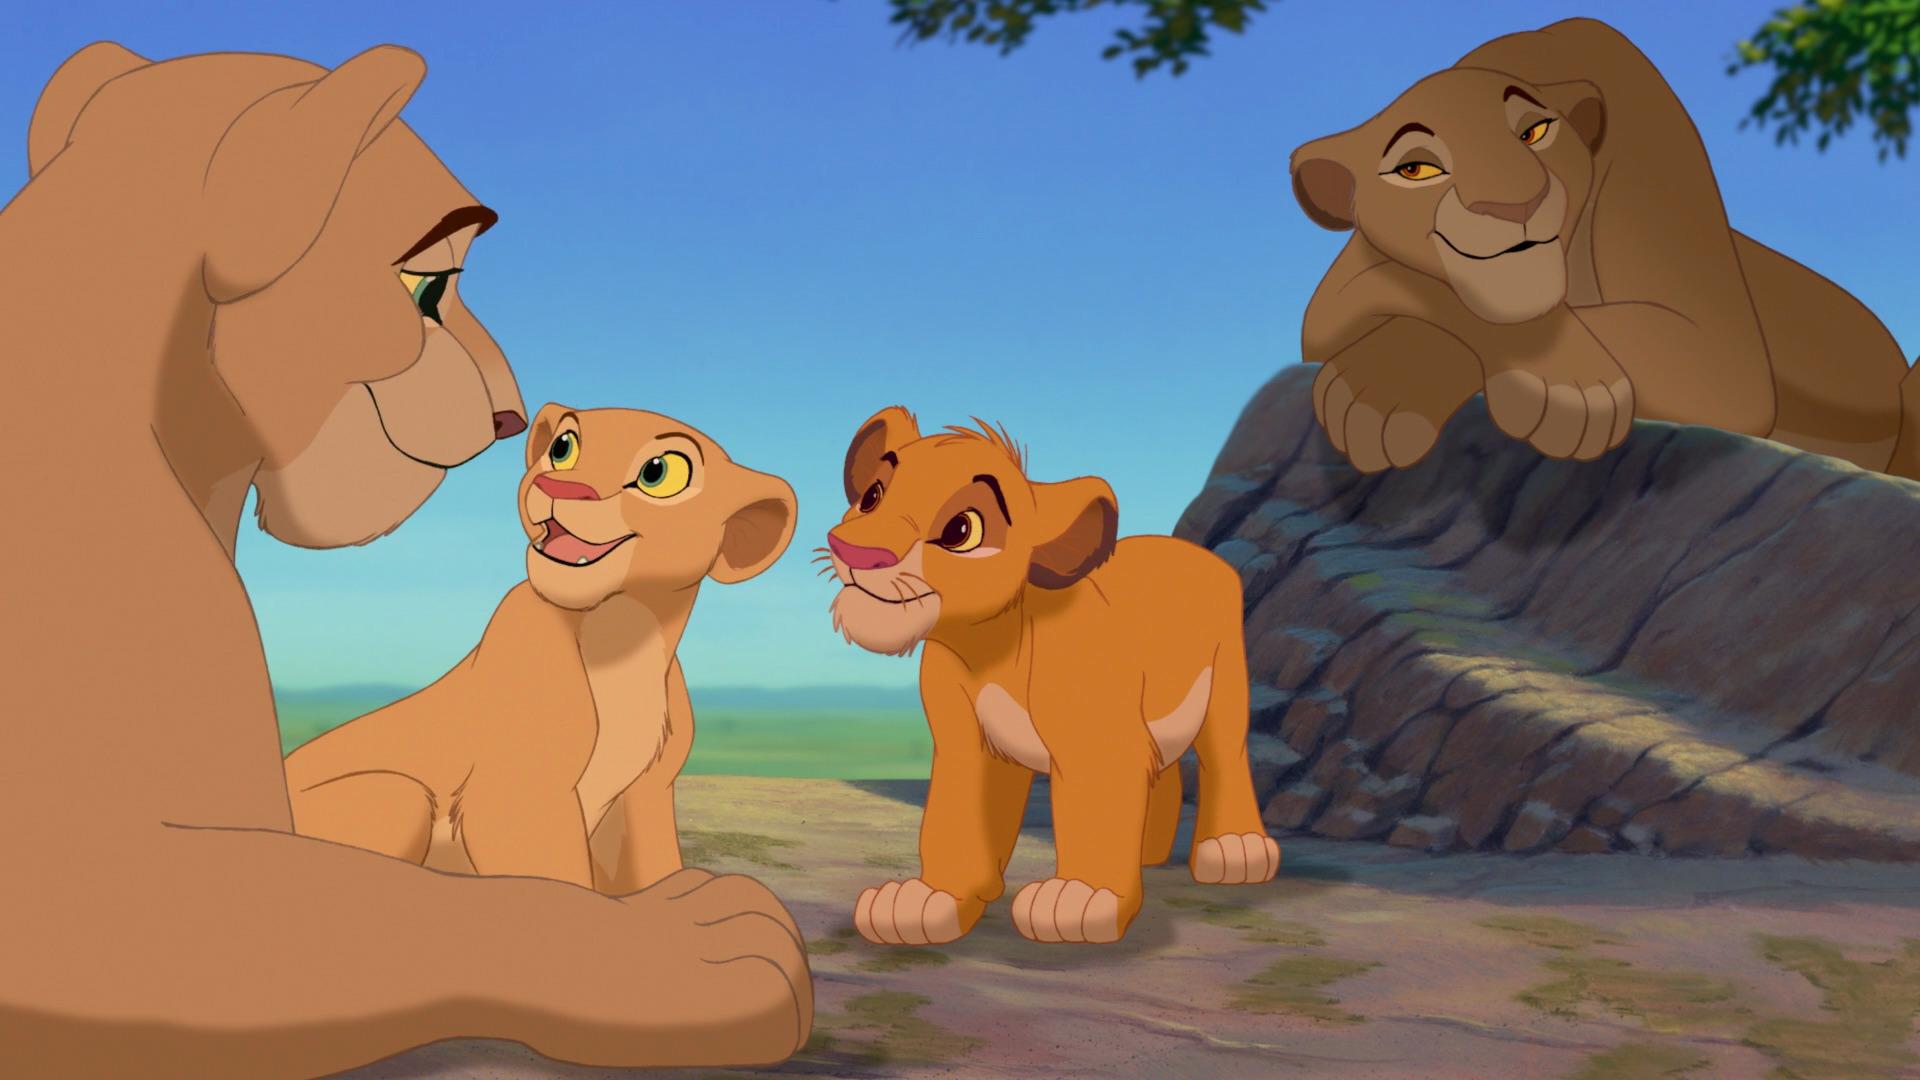 Lion King Disneyscreencaps - King Simba And Nala Cubs , HD Wallpaper & Backgrounds